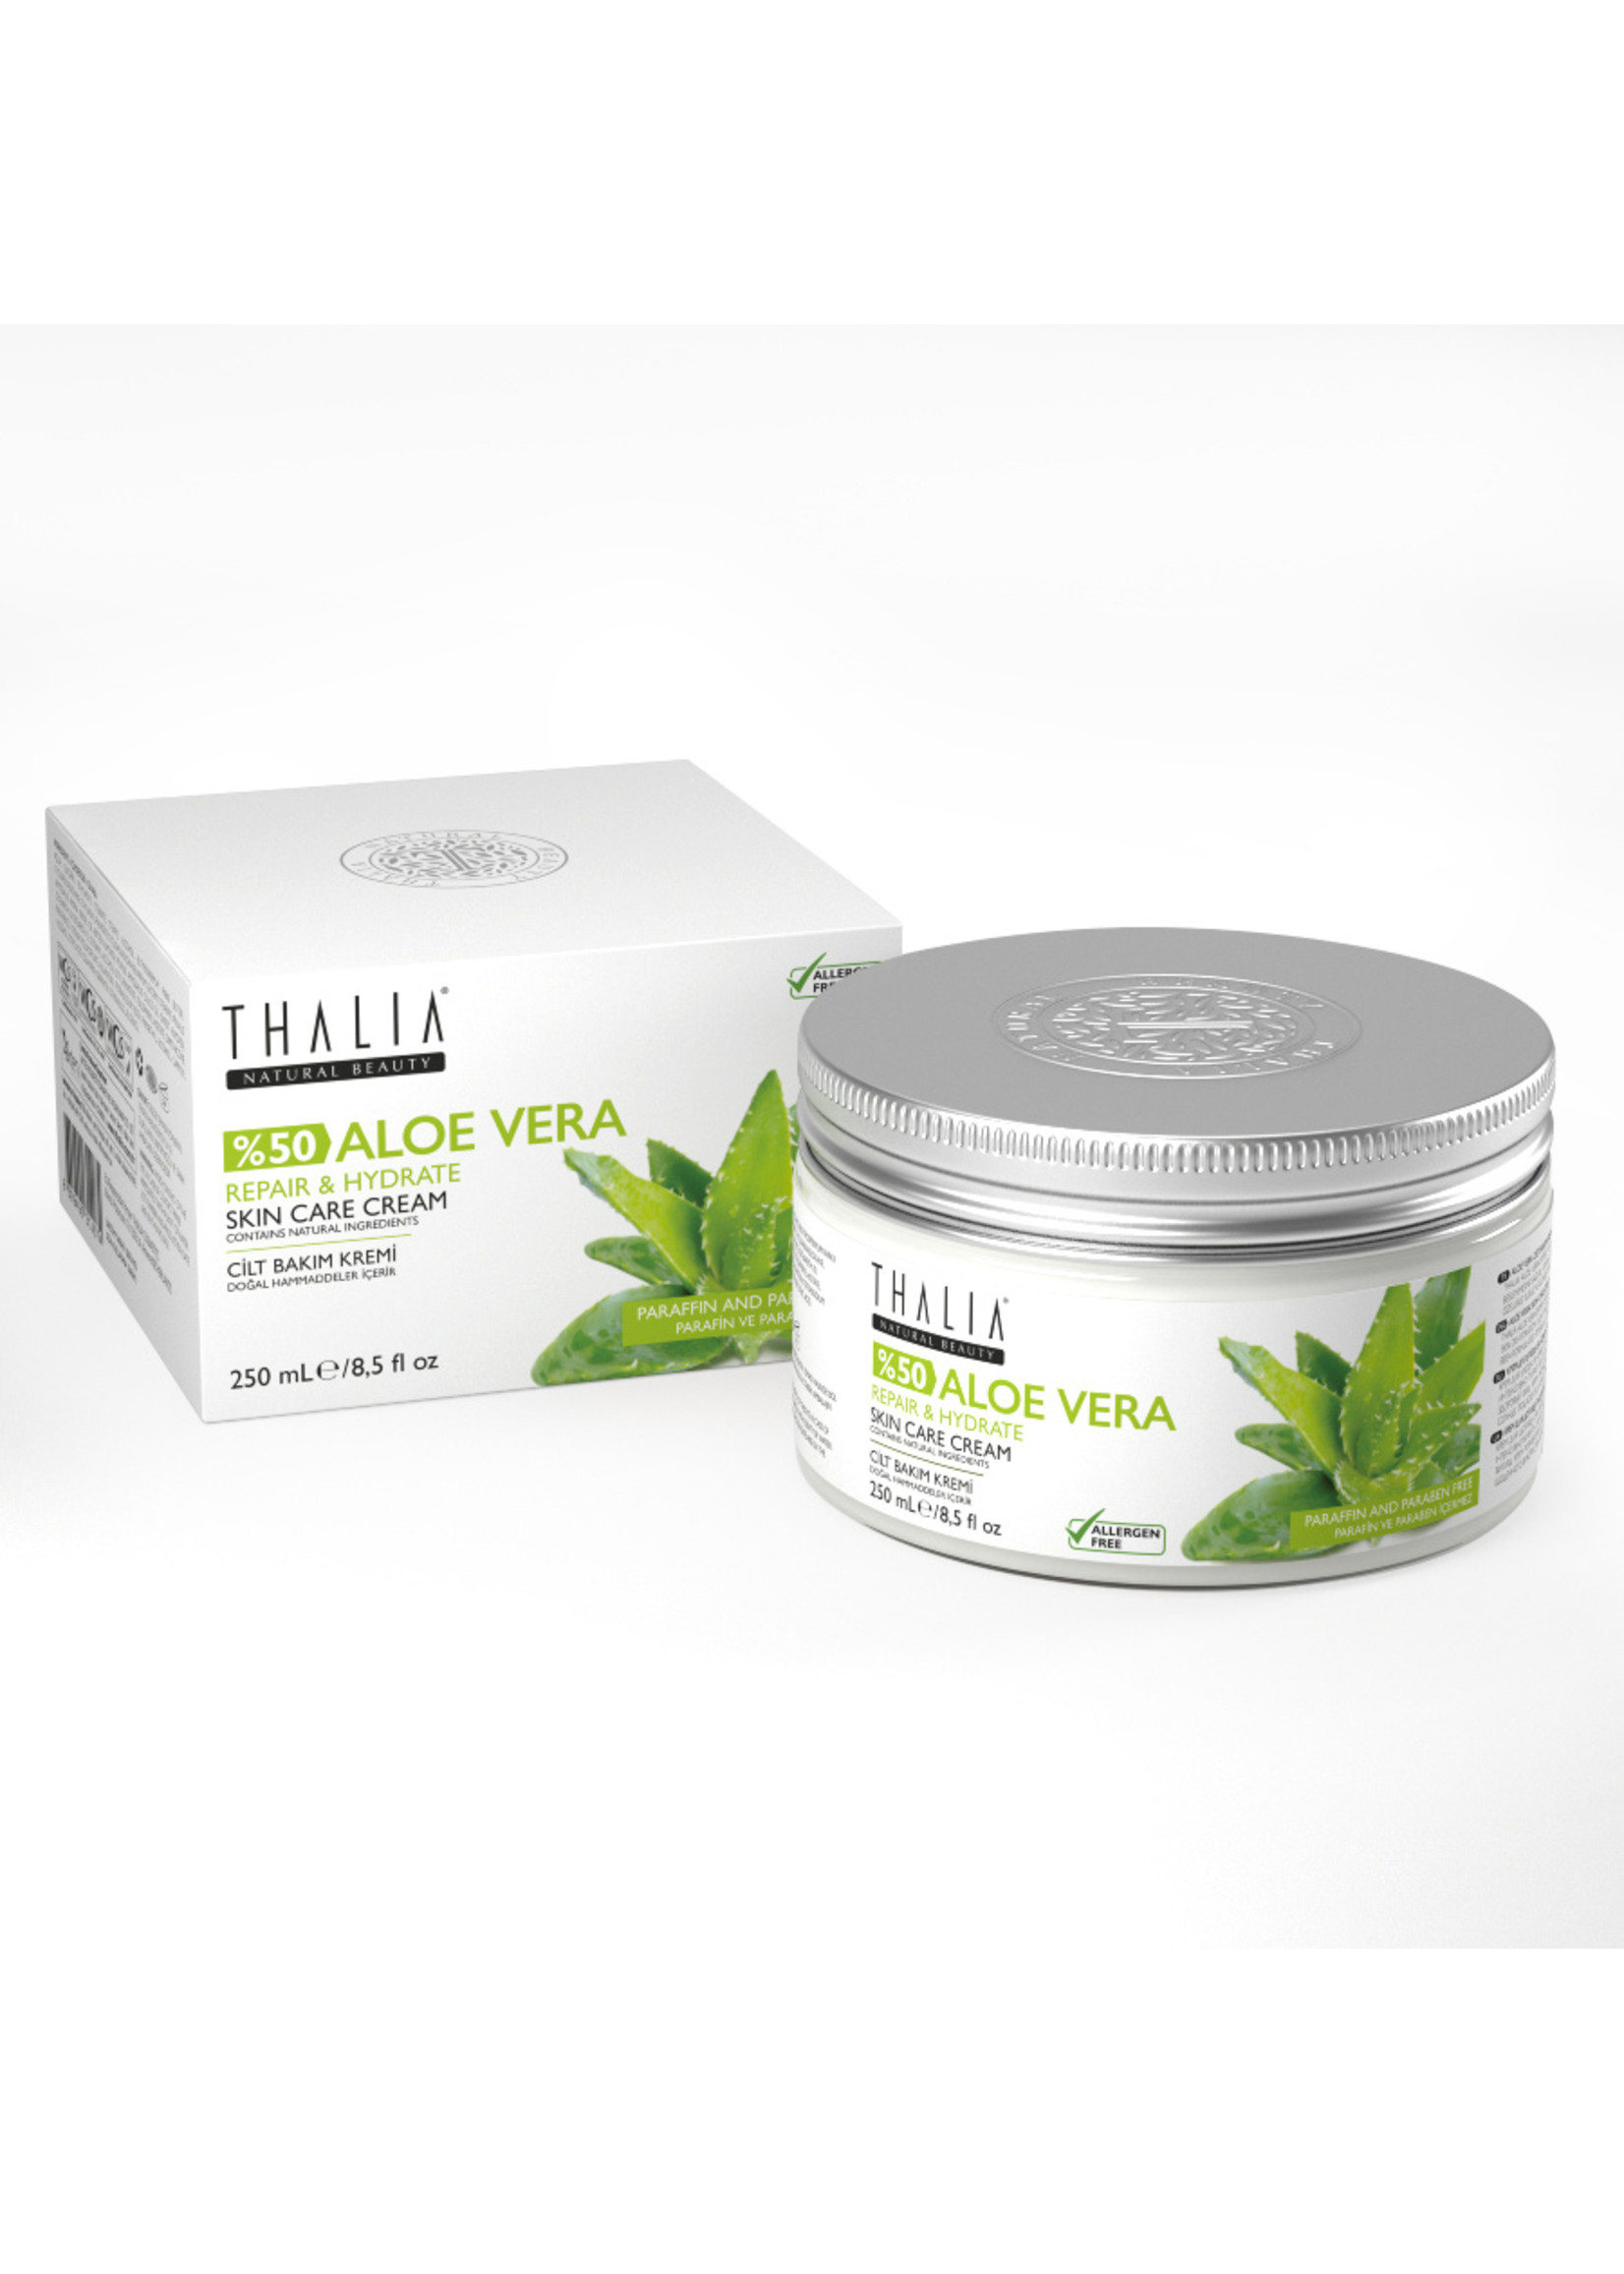 Thalia Aloe Vera Skin Care Cream - 250 ml